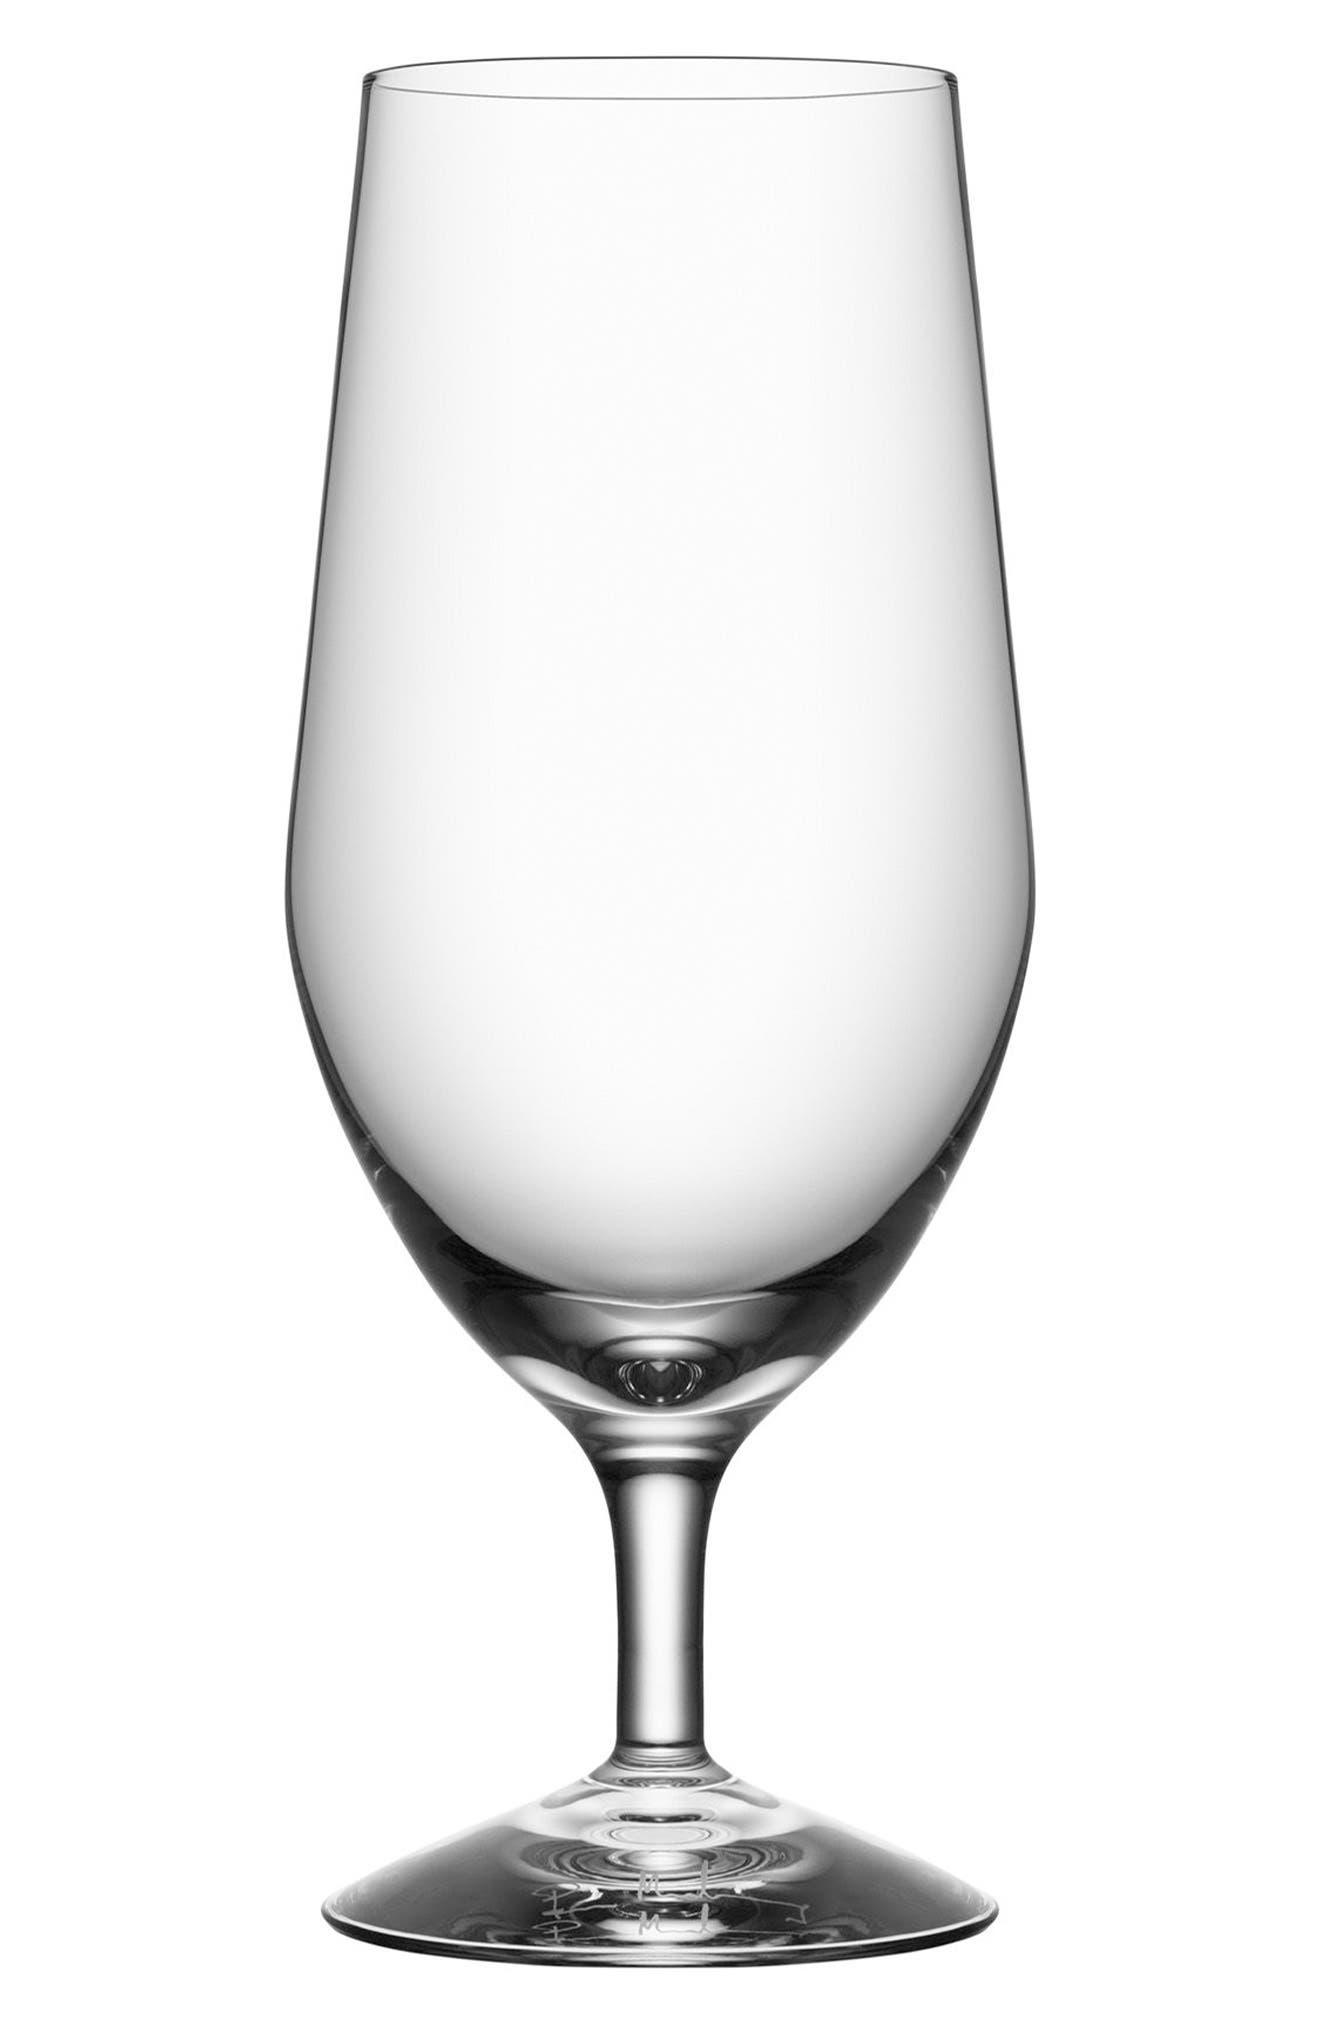 Main Image - Orrefors Morberg Collection Set of 4 Crystal Beer Glasses